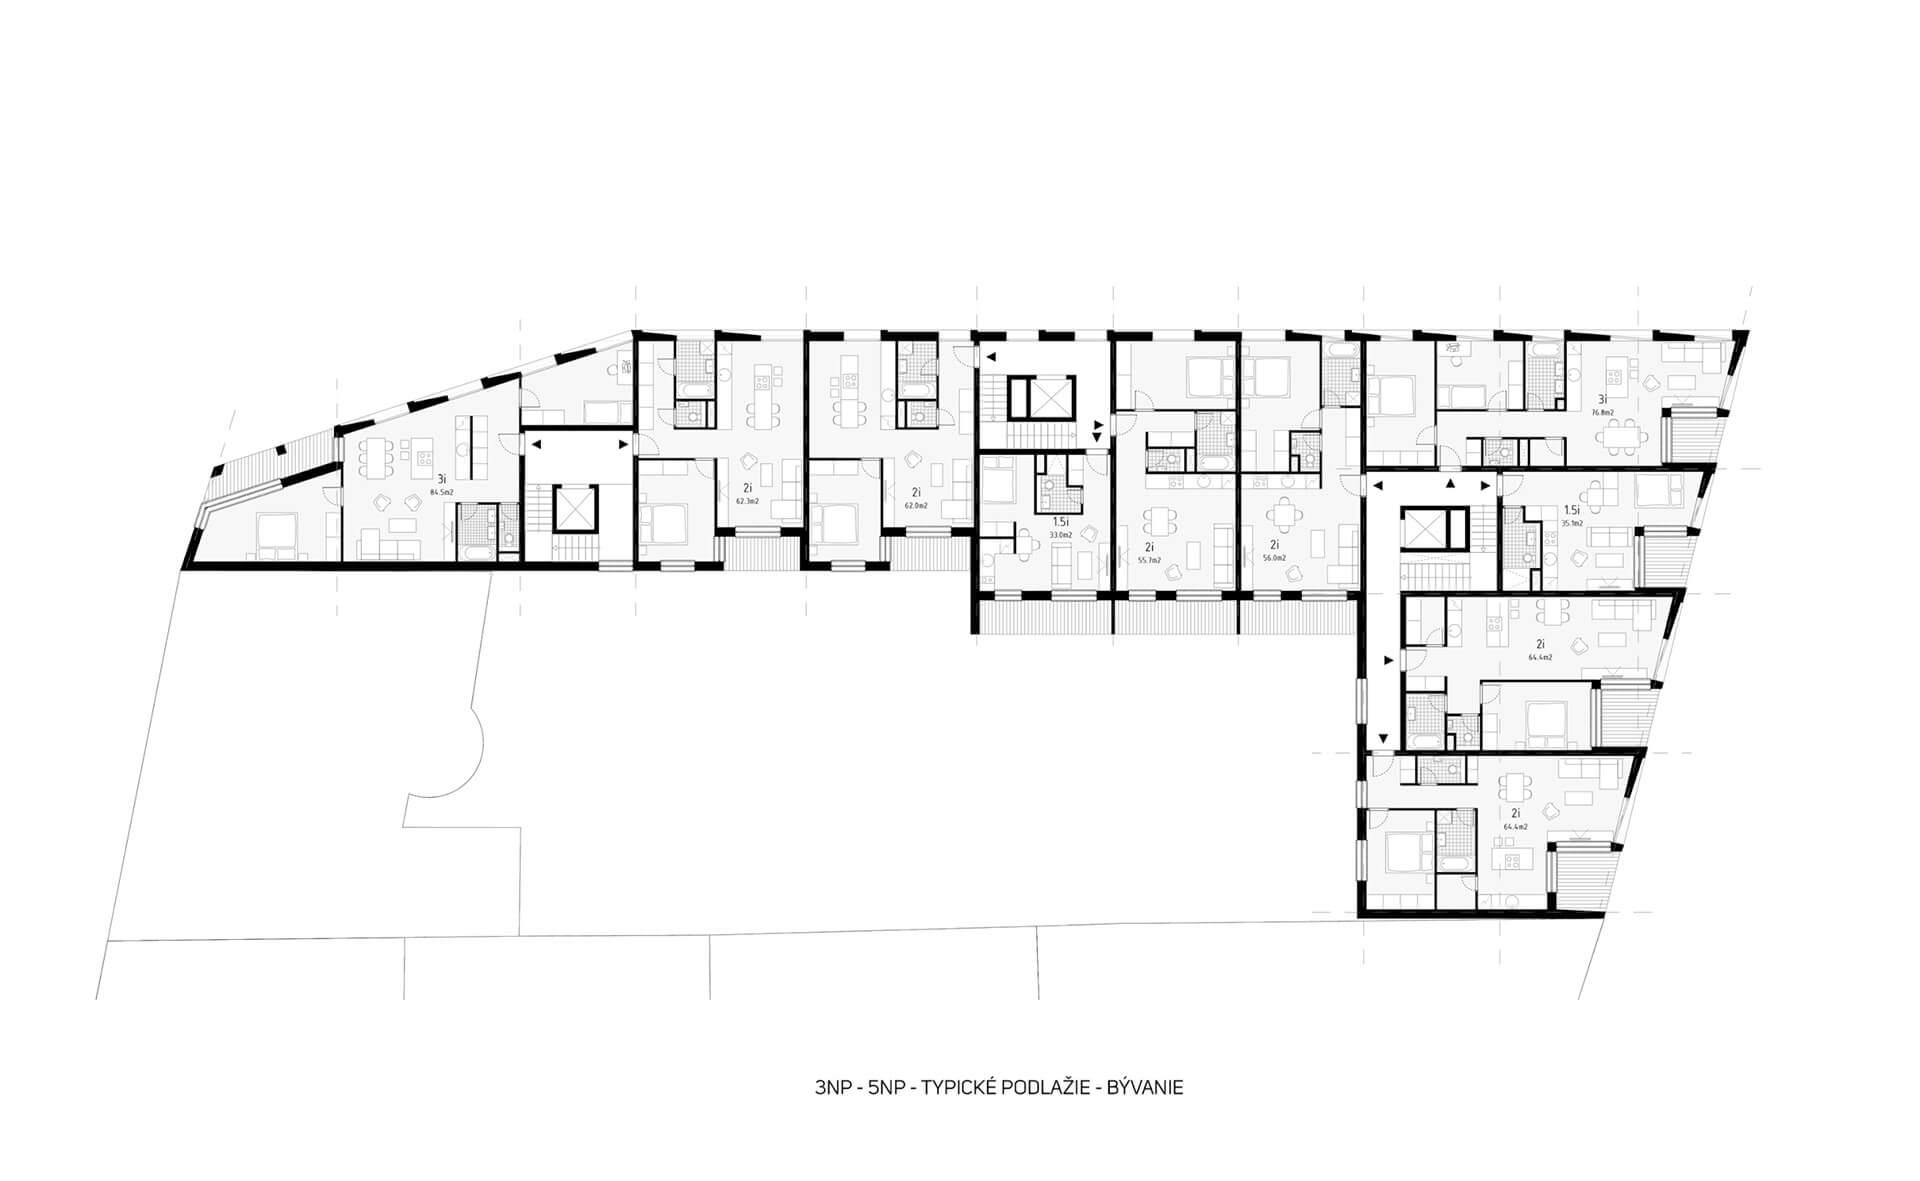 sutaz-bytovy-dom-ostrava_schema_gif_5